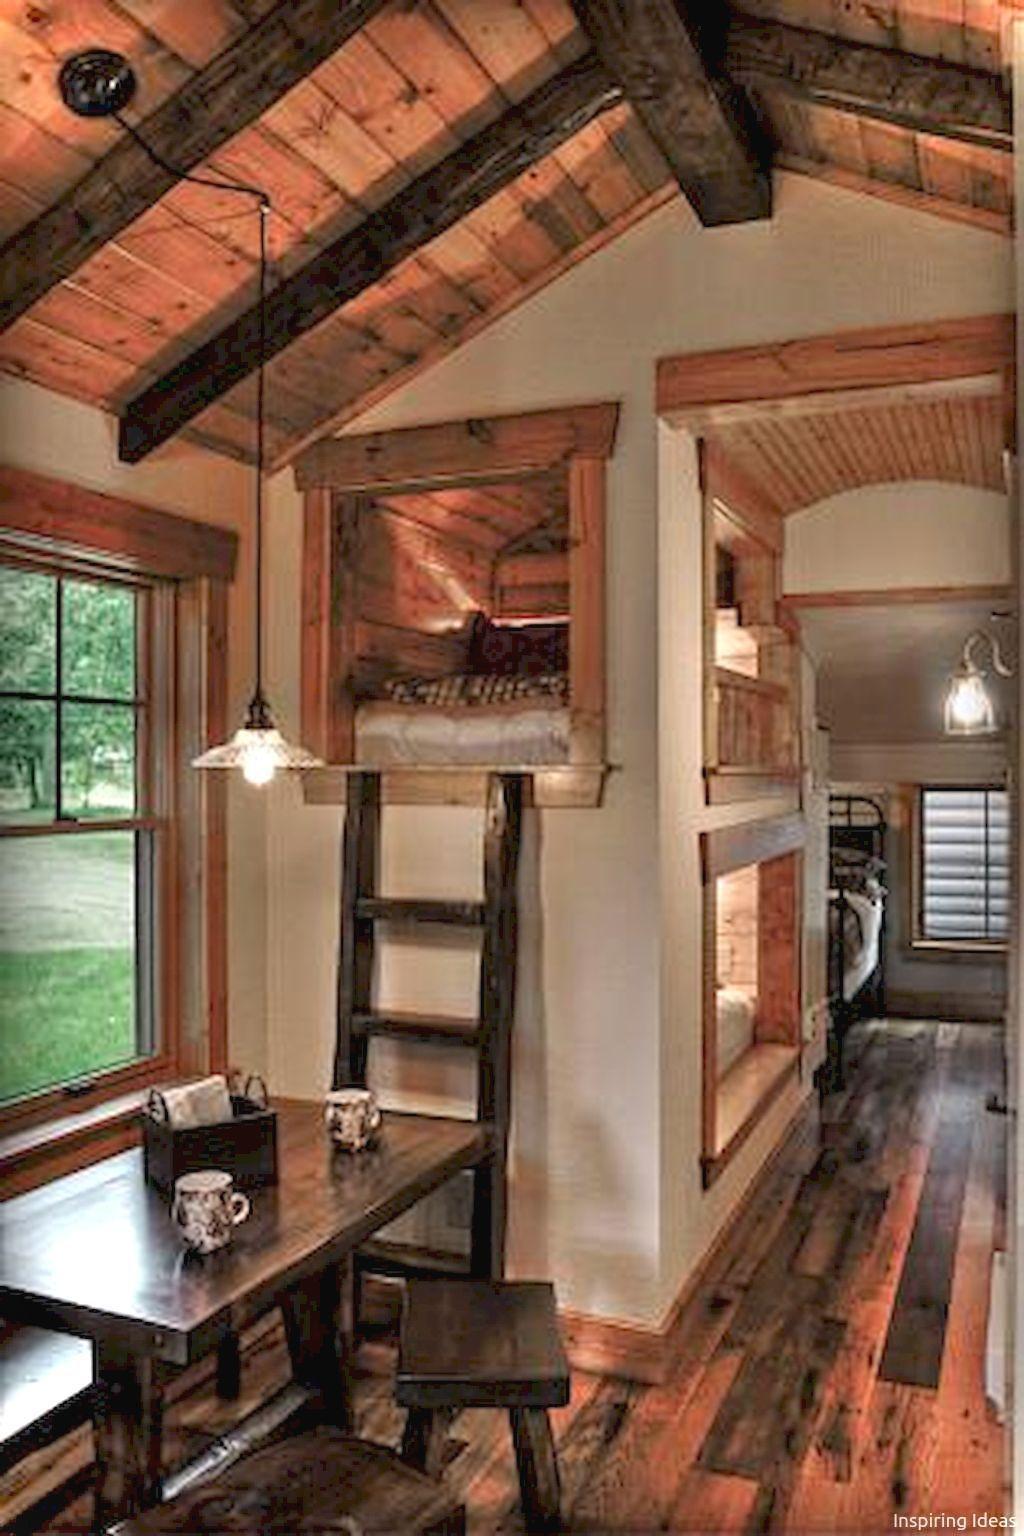 Incredible tiny house interior design ideas also ideas rh pinterest